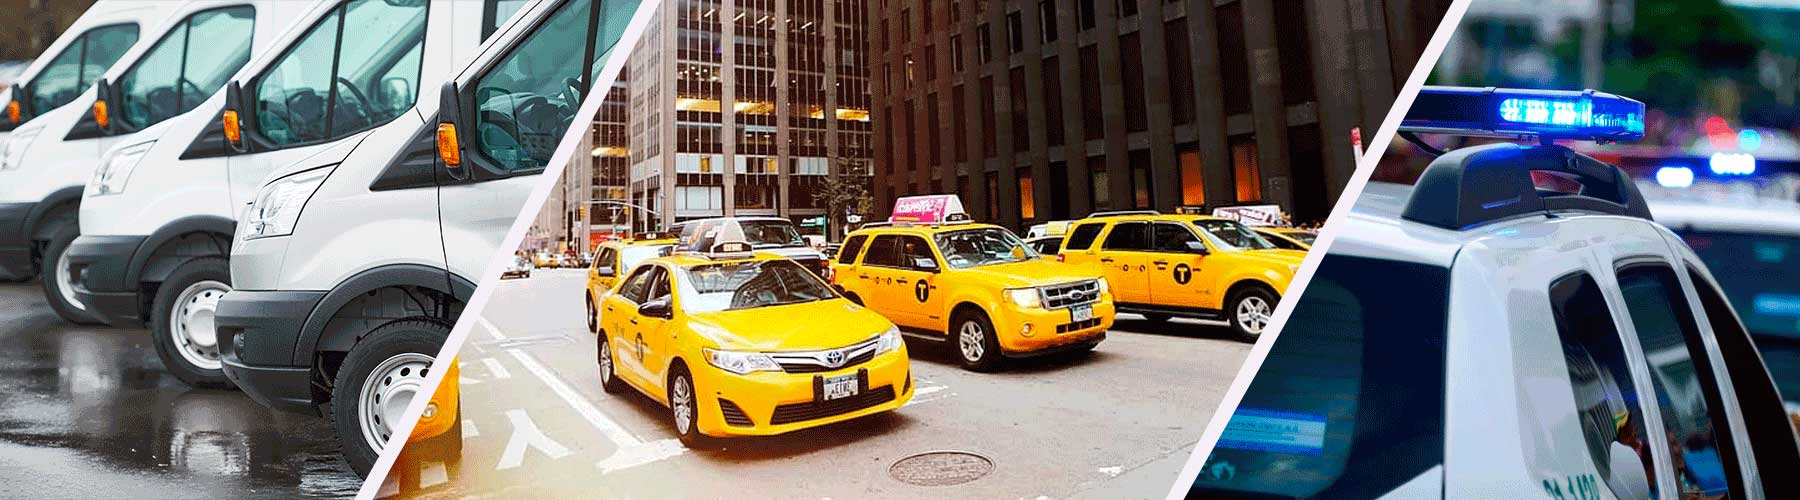 Car wash fleet and business accounts